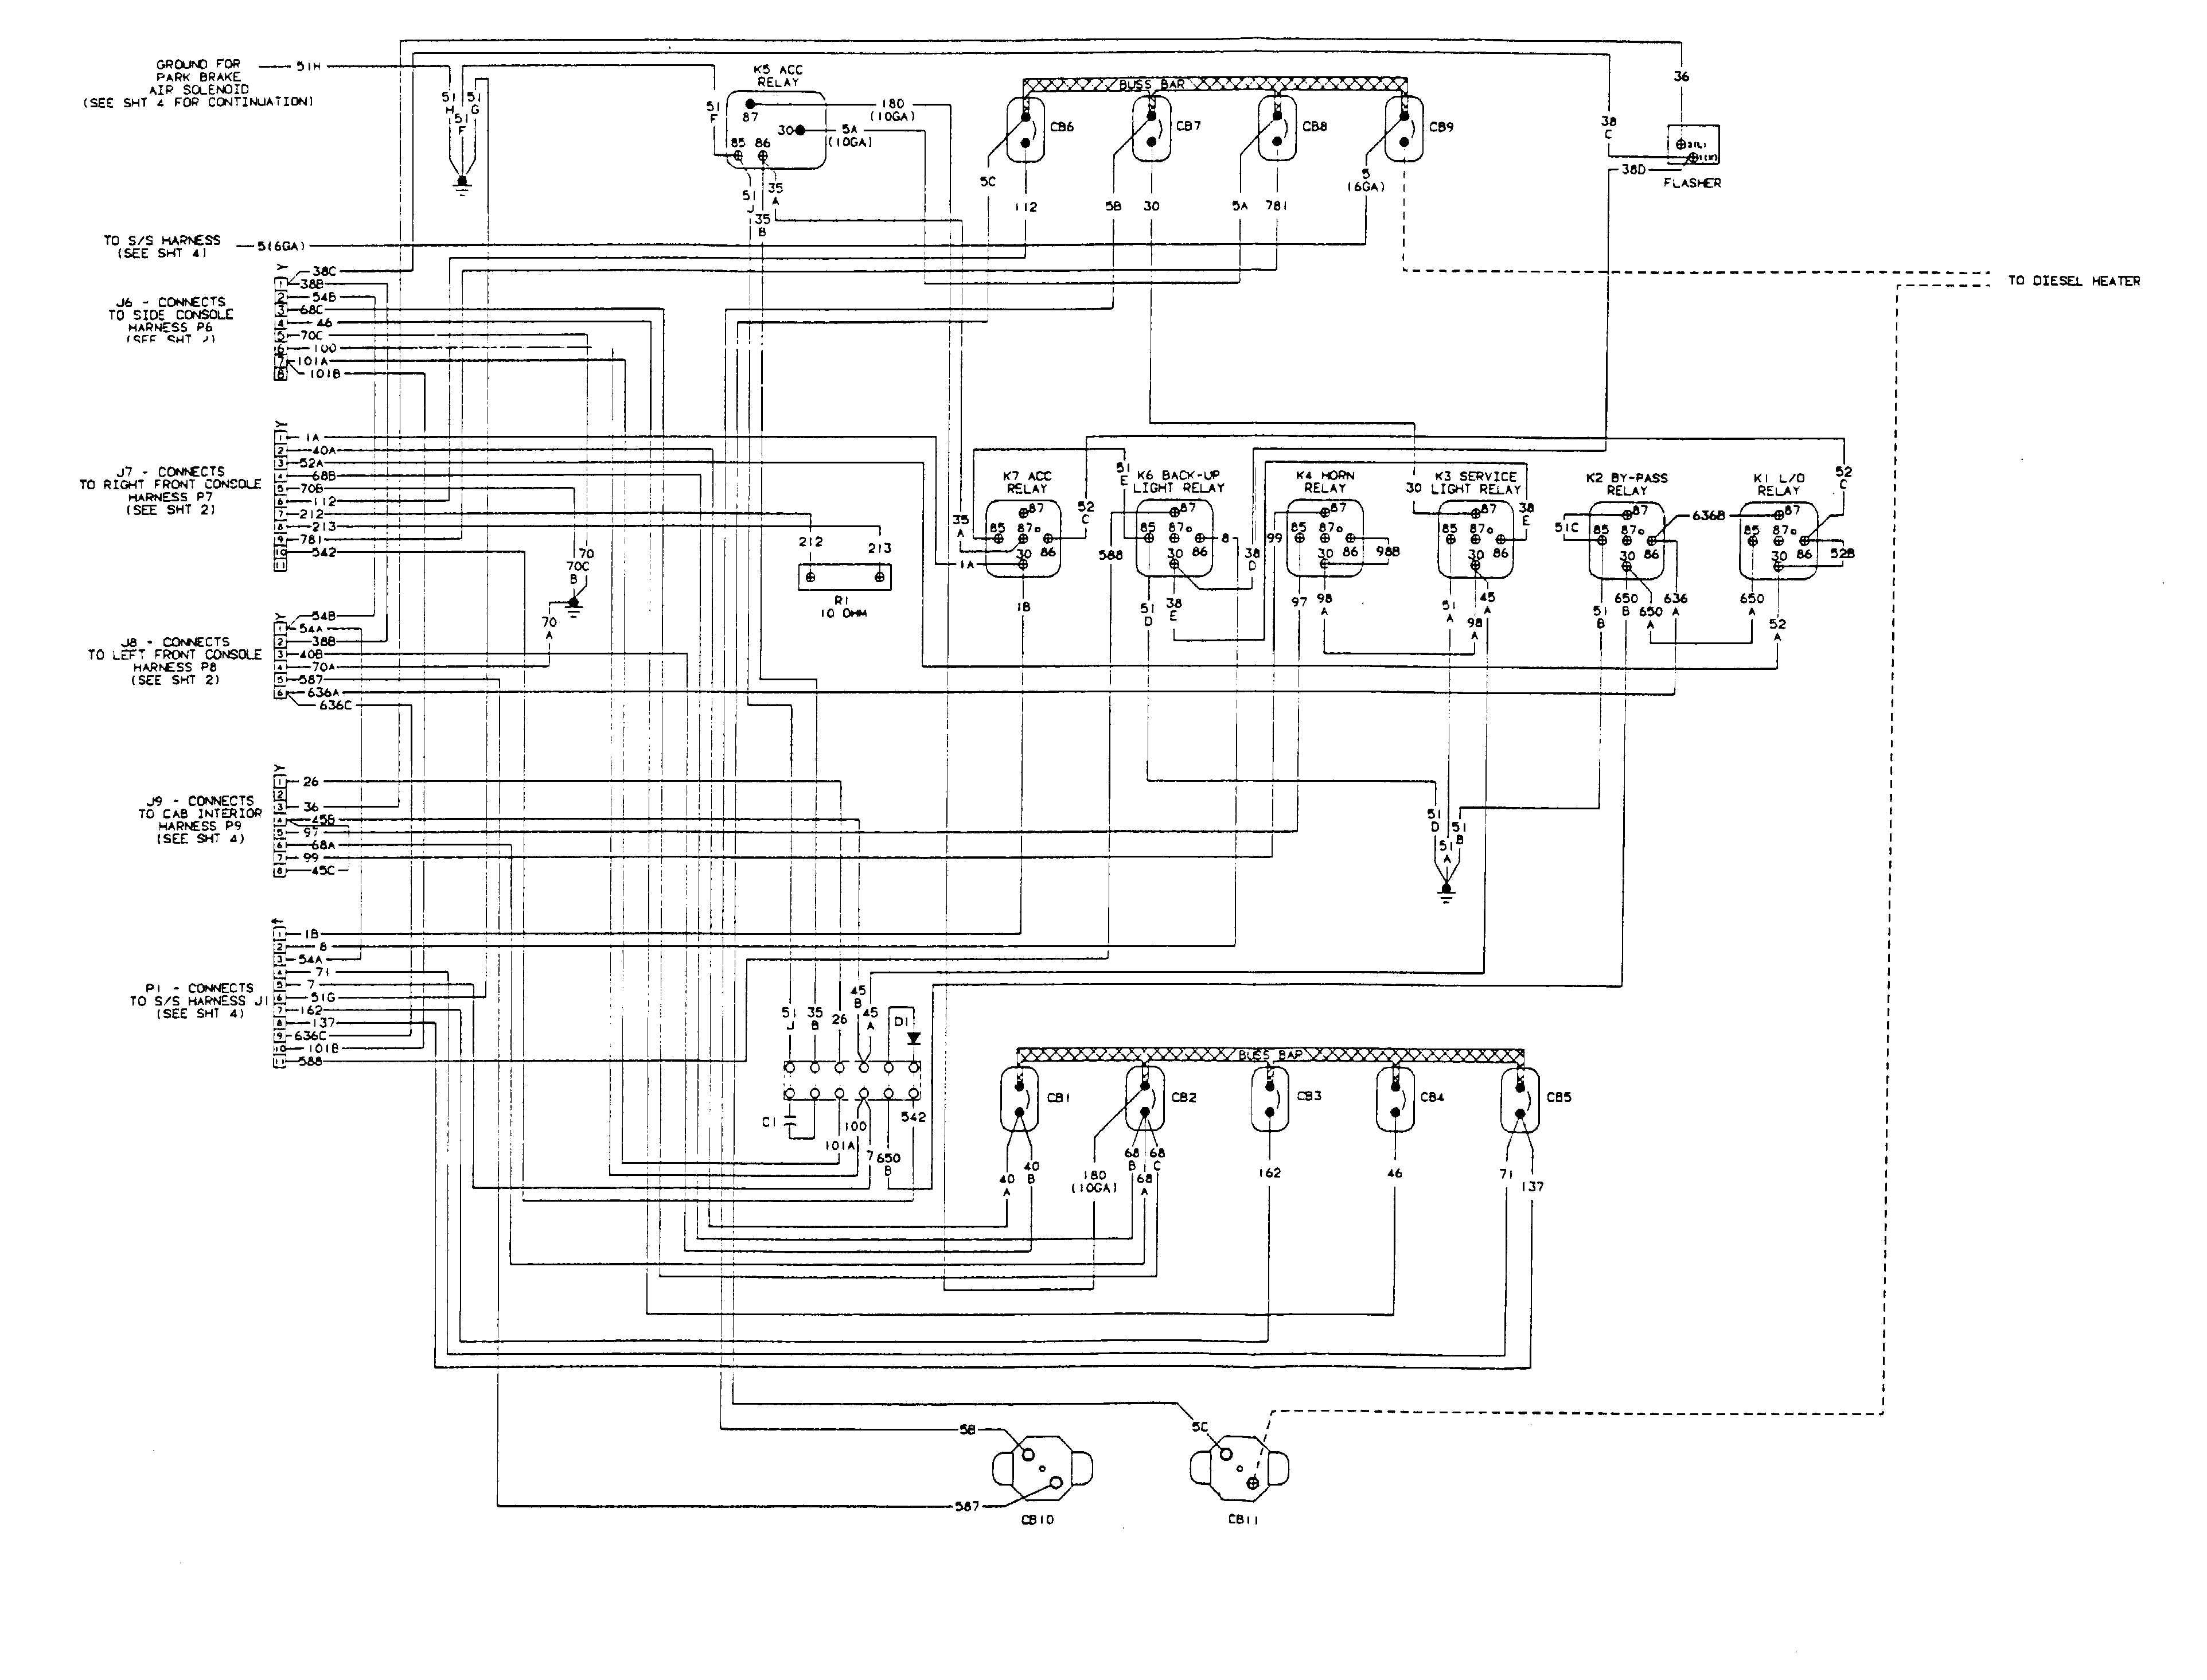 coffing hoist wiring diagram coffing hoist wiring diagram download coffing hoist wiring diagram awesome beautiful overhead crane wiring diagram 17t jpg